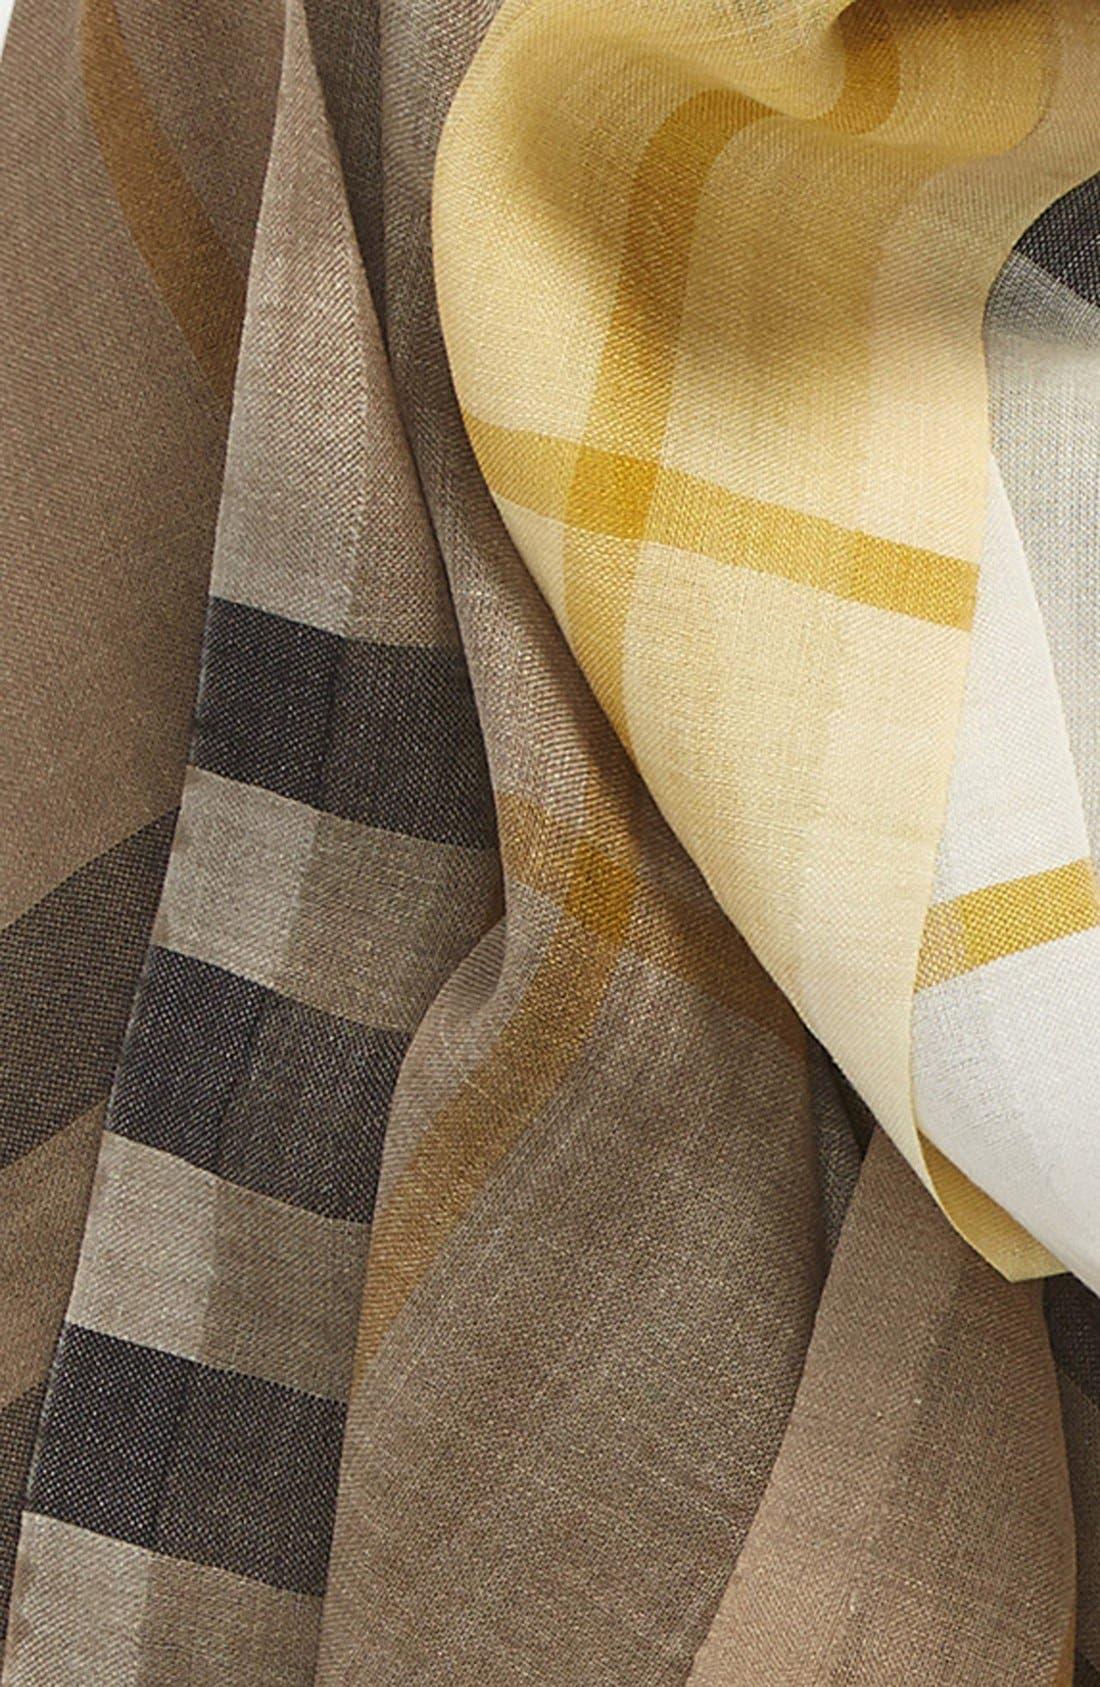 Ombré Check Wool & Silk Scarf,                             Alternate thumbnail 12, color,